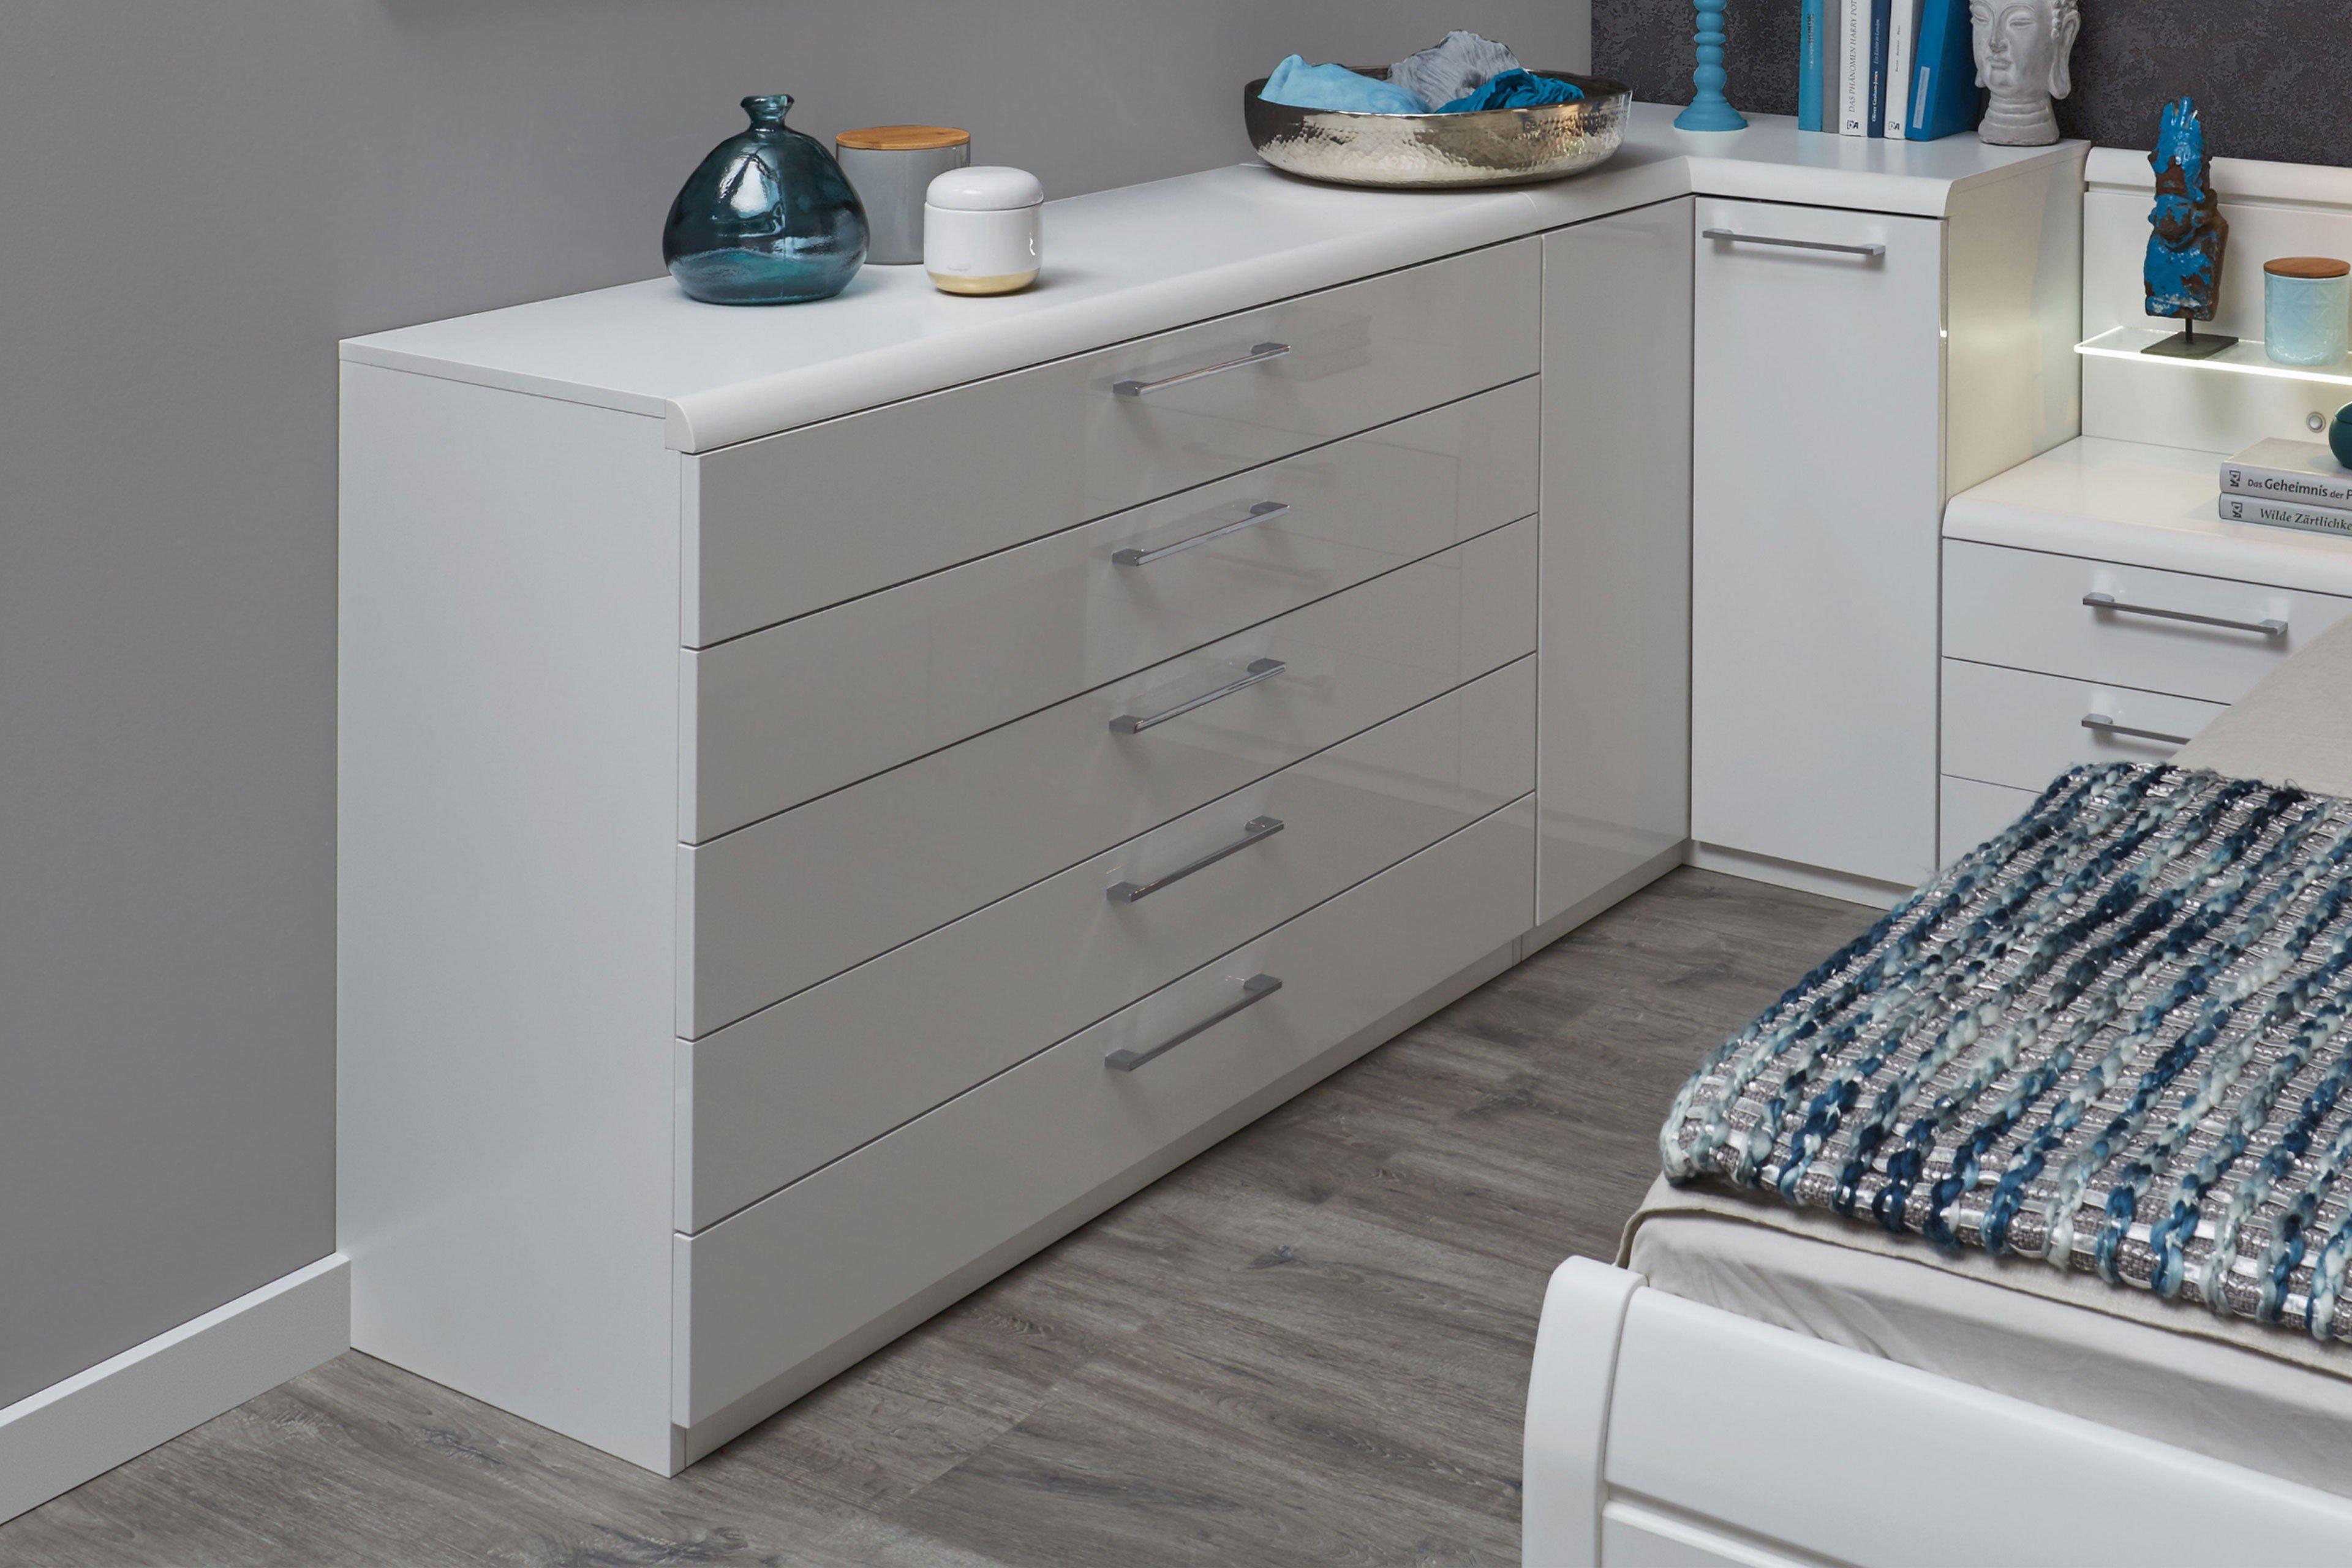 disselkamp kommode comfort v hochglanz wei m bel letz ihr online shop. Black Bedroom Furniture Sets. Home Design Ideas